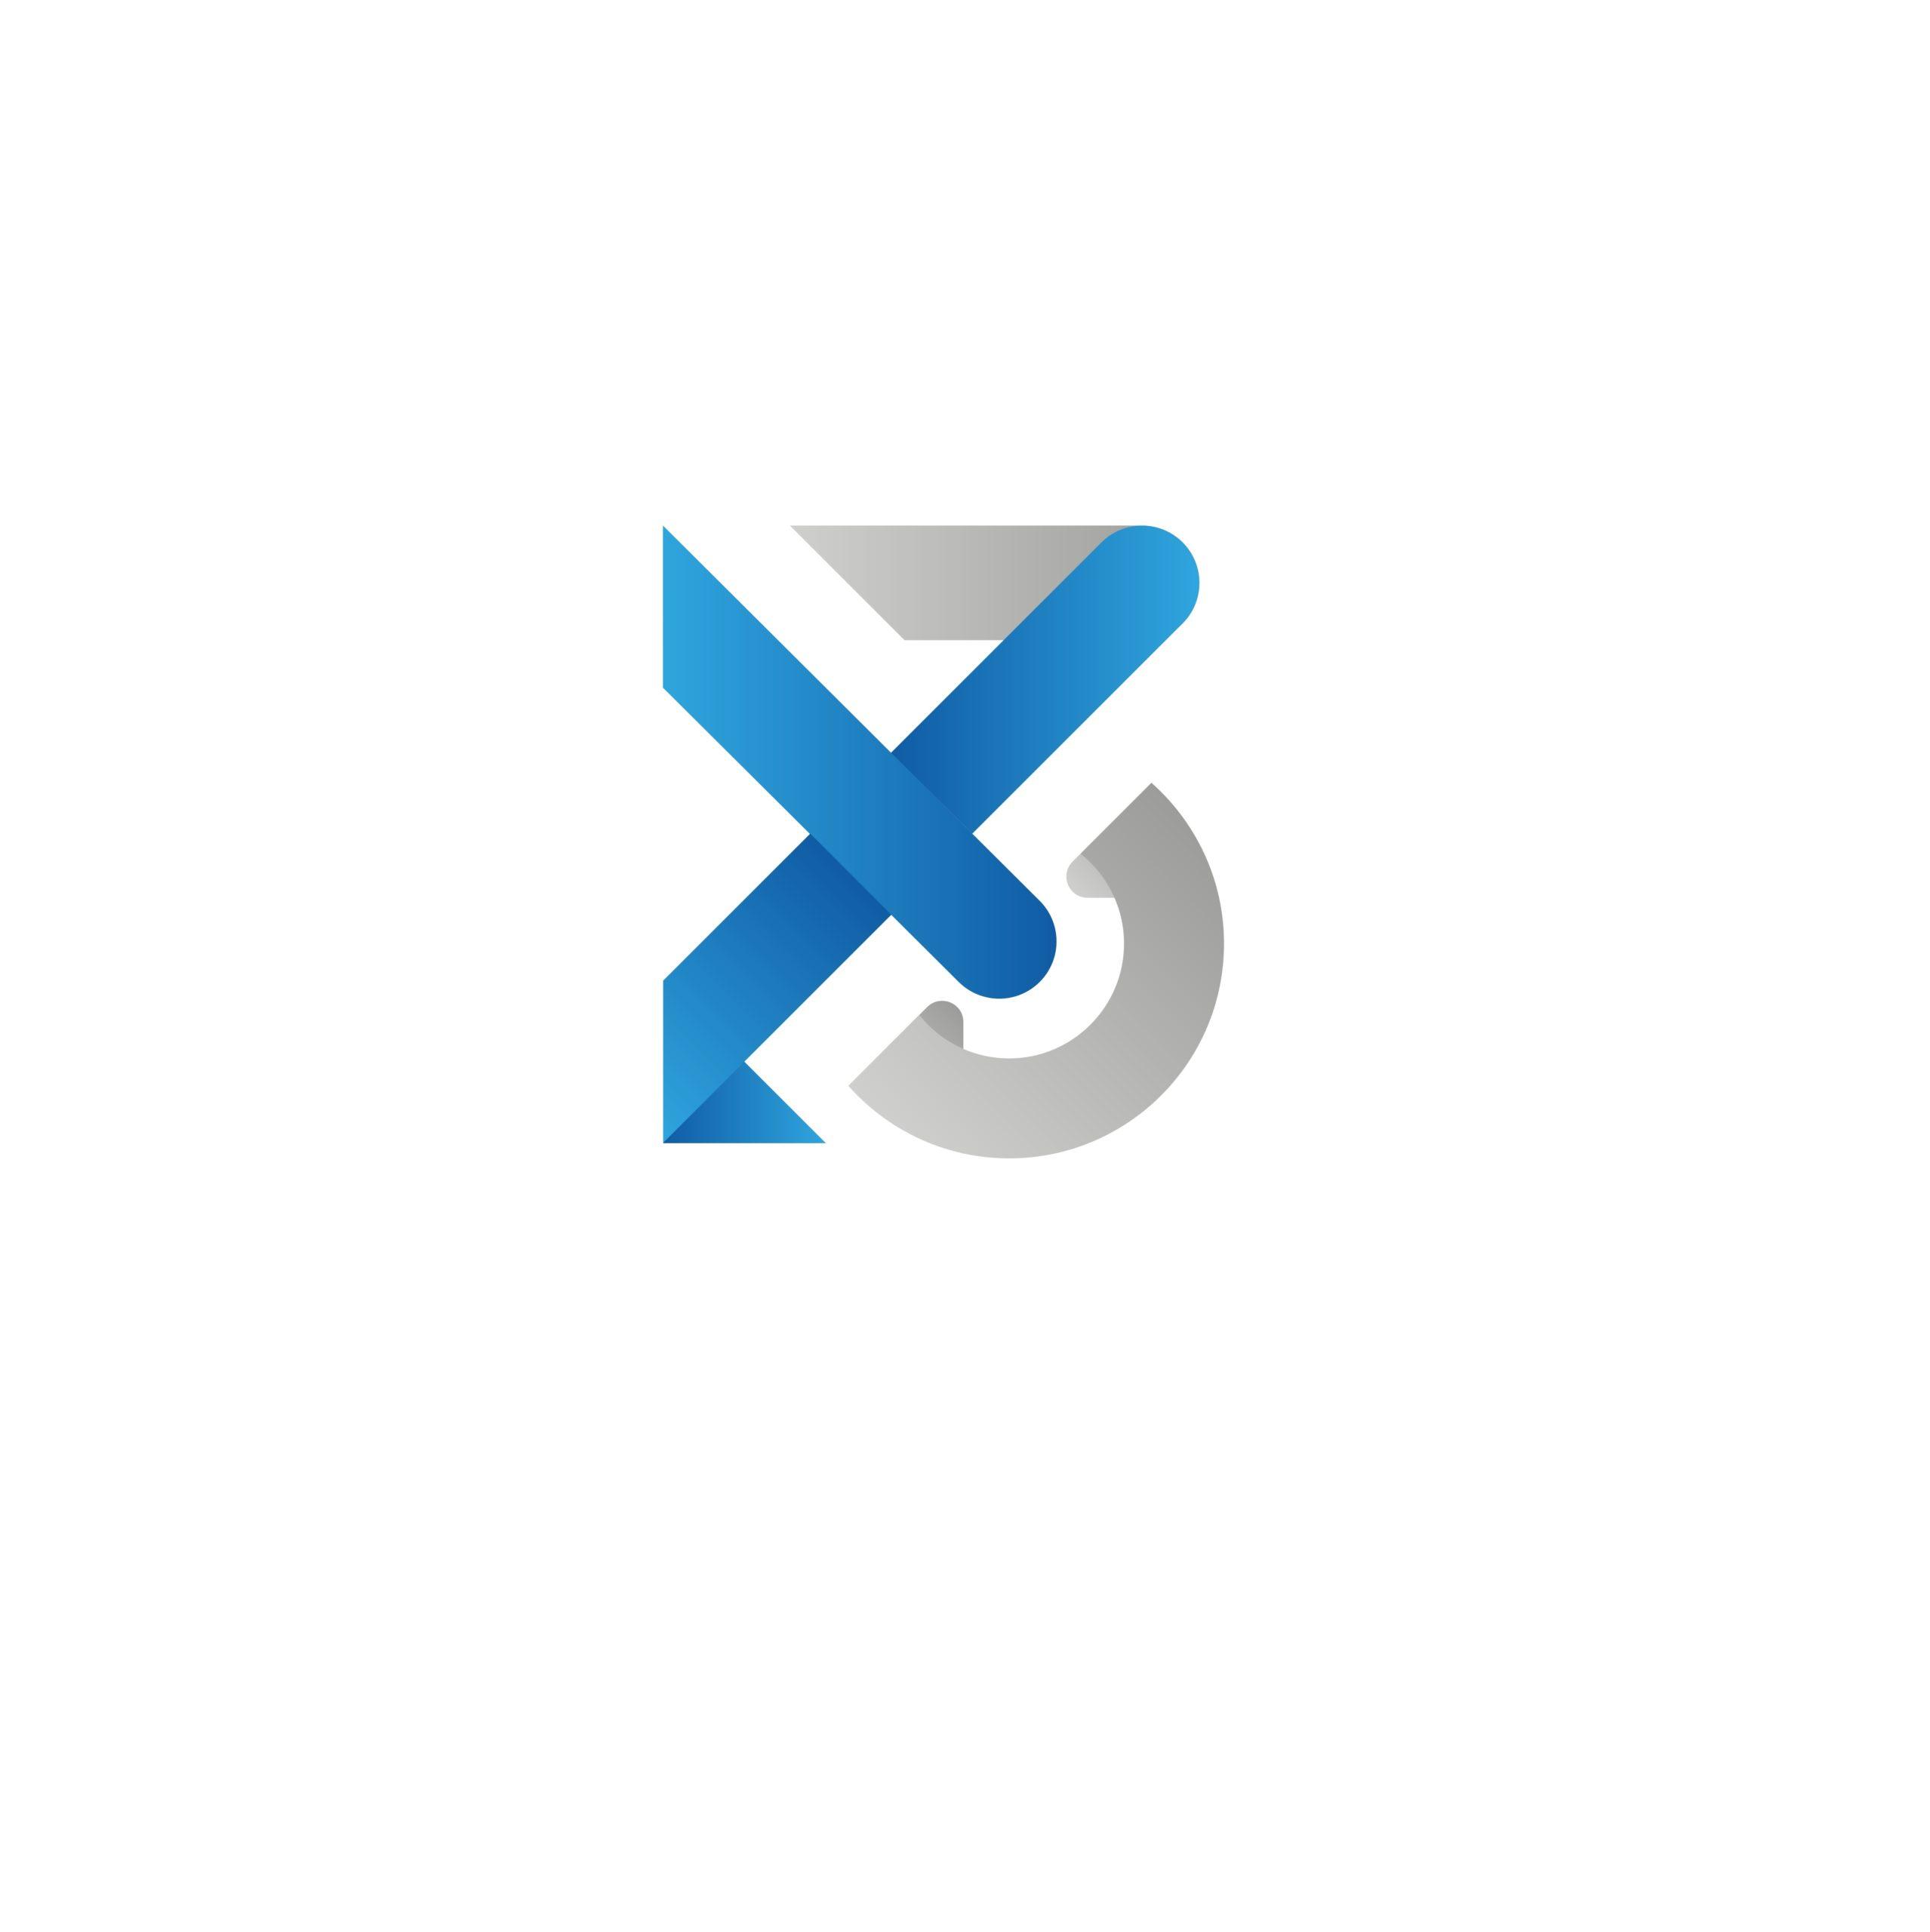 X3Solutions SRL